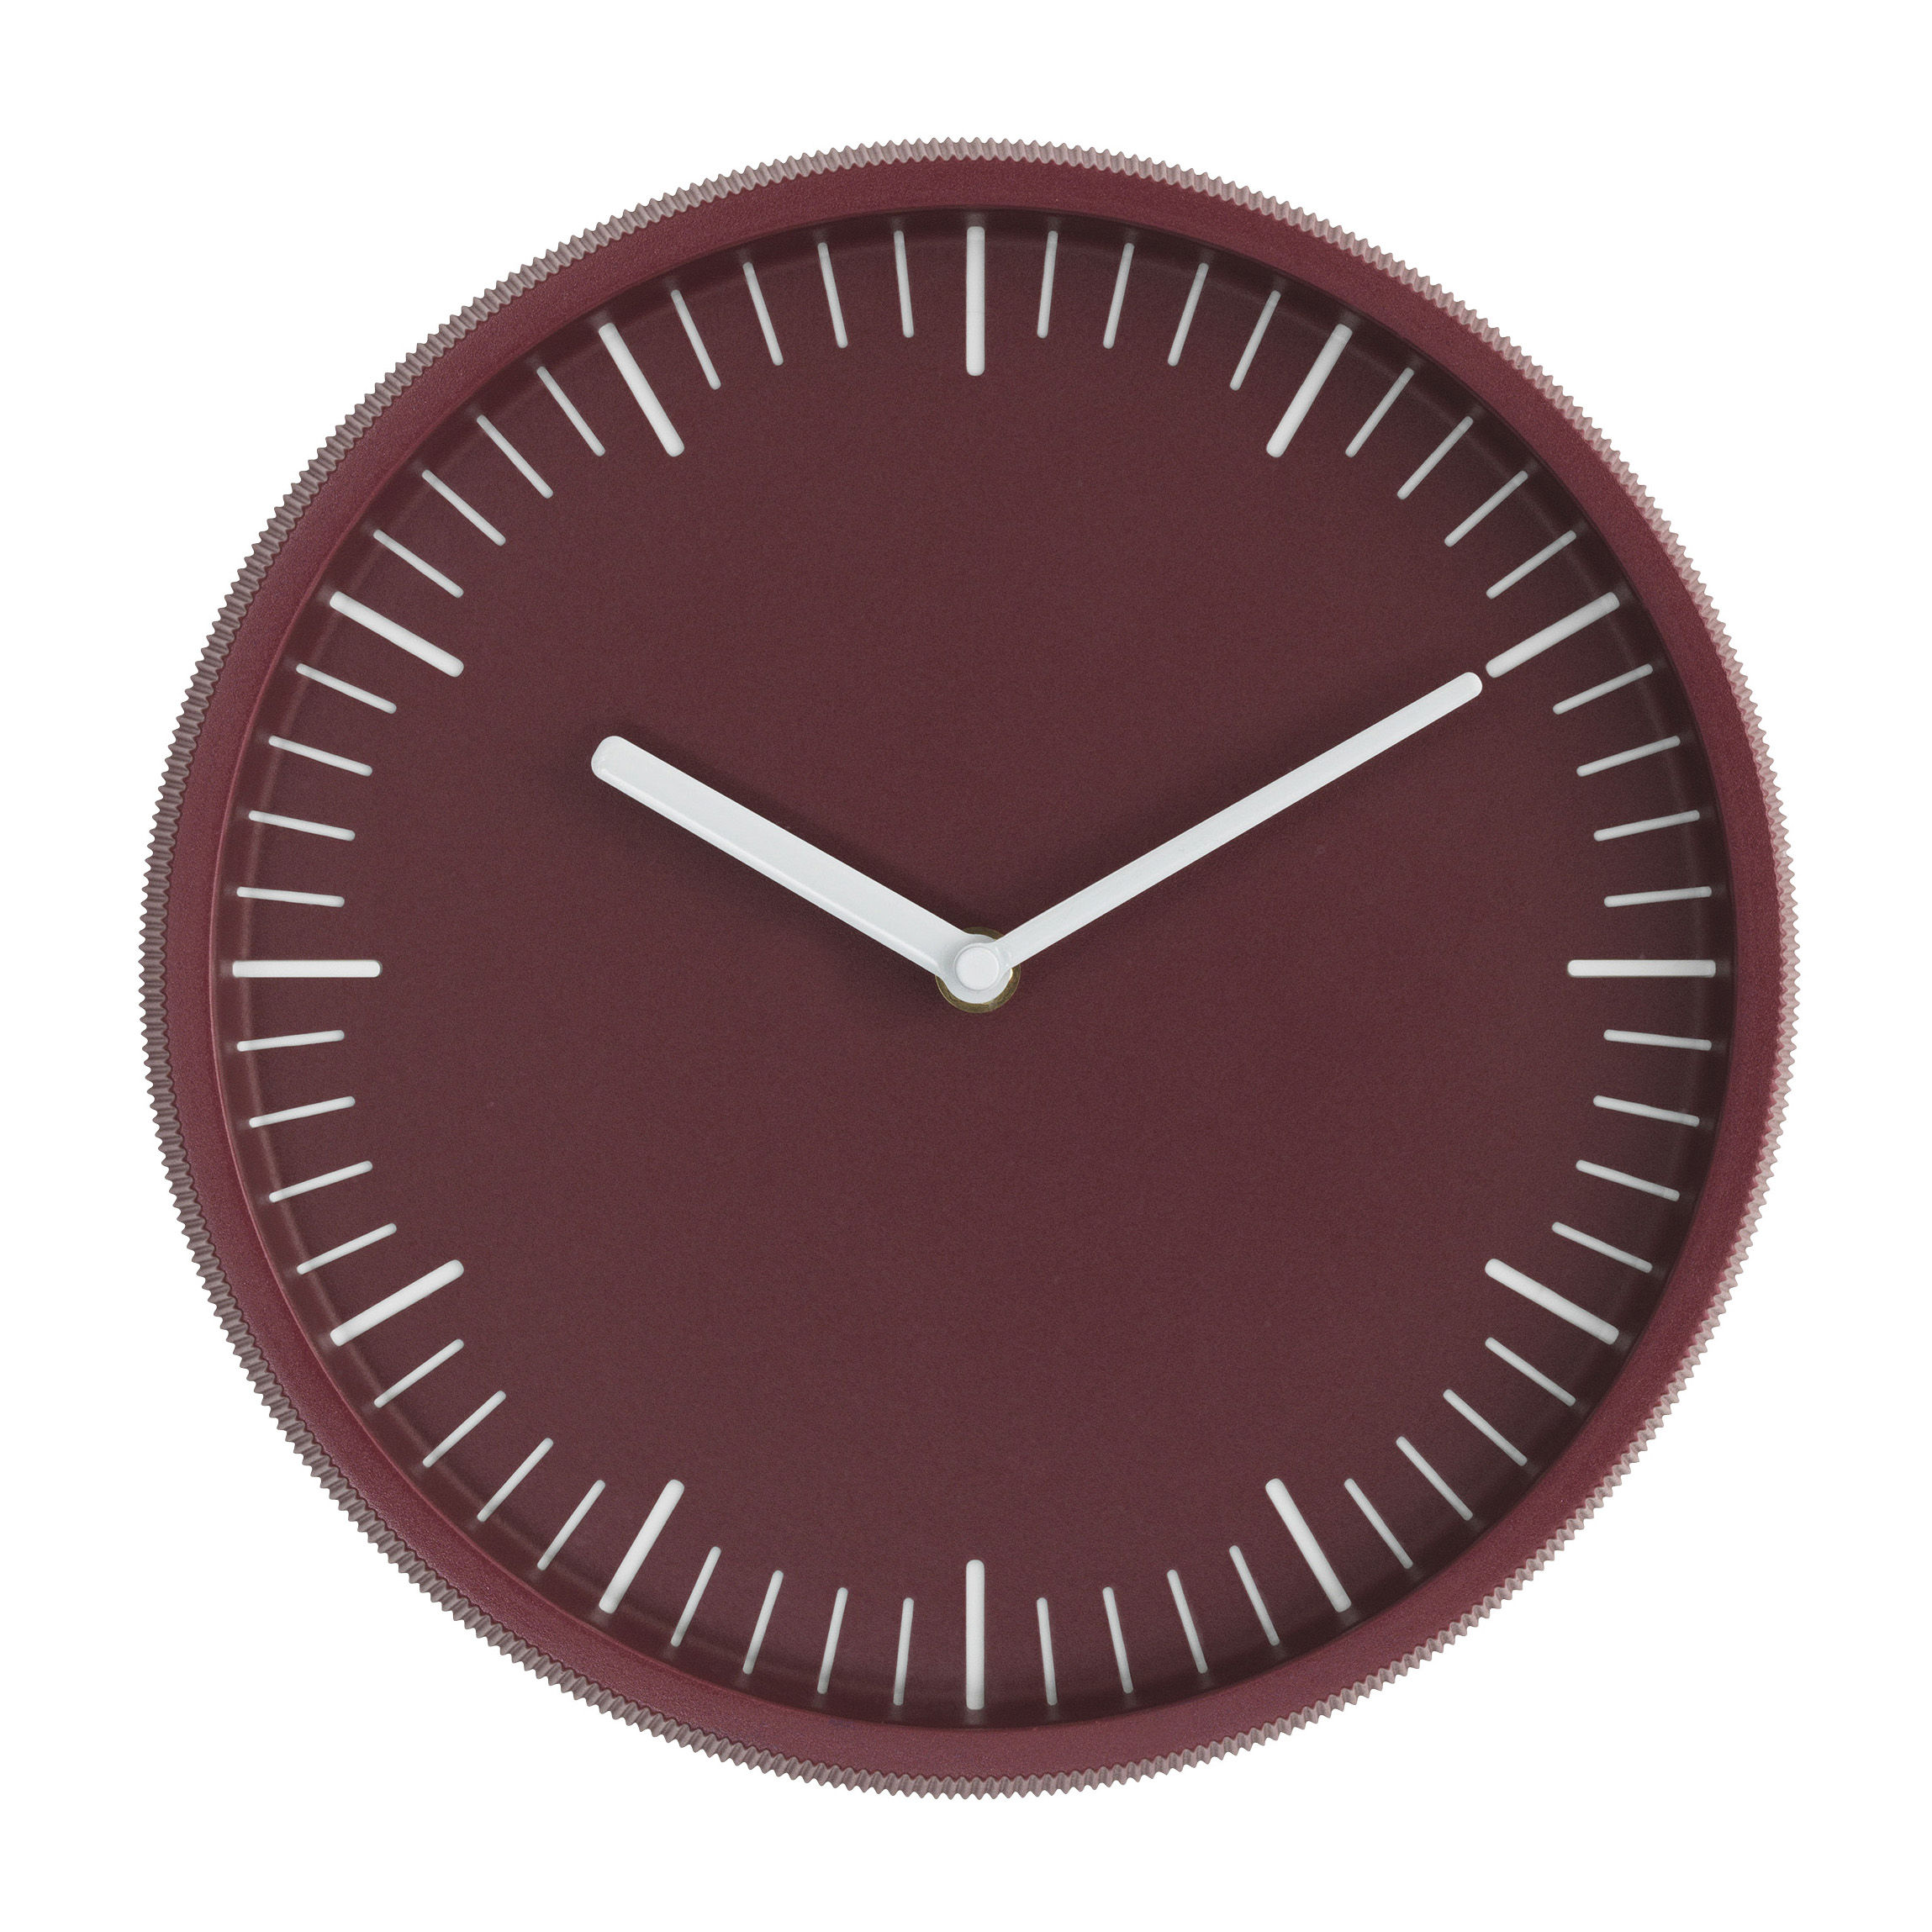 Decoration - Wall Clocks - Day Wall clock - / Steel - Ø 28 cm by Normann Copenhagen - Burgundy - Cast aluminium, Glass